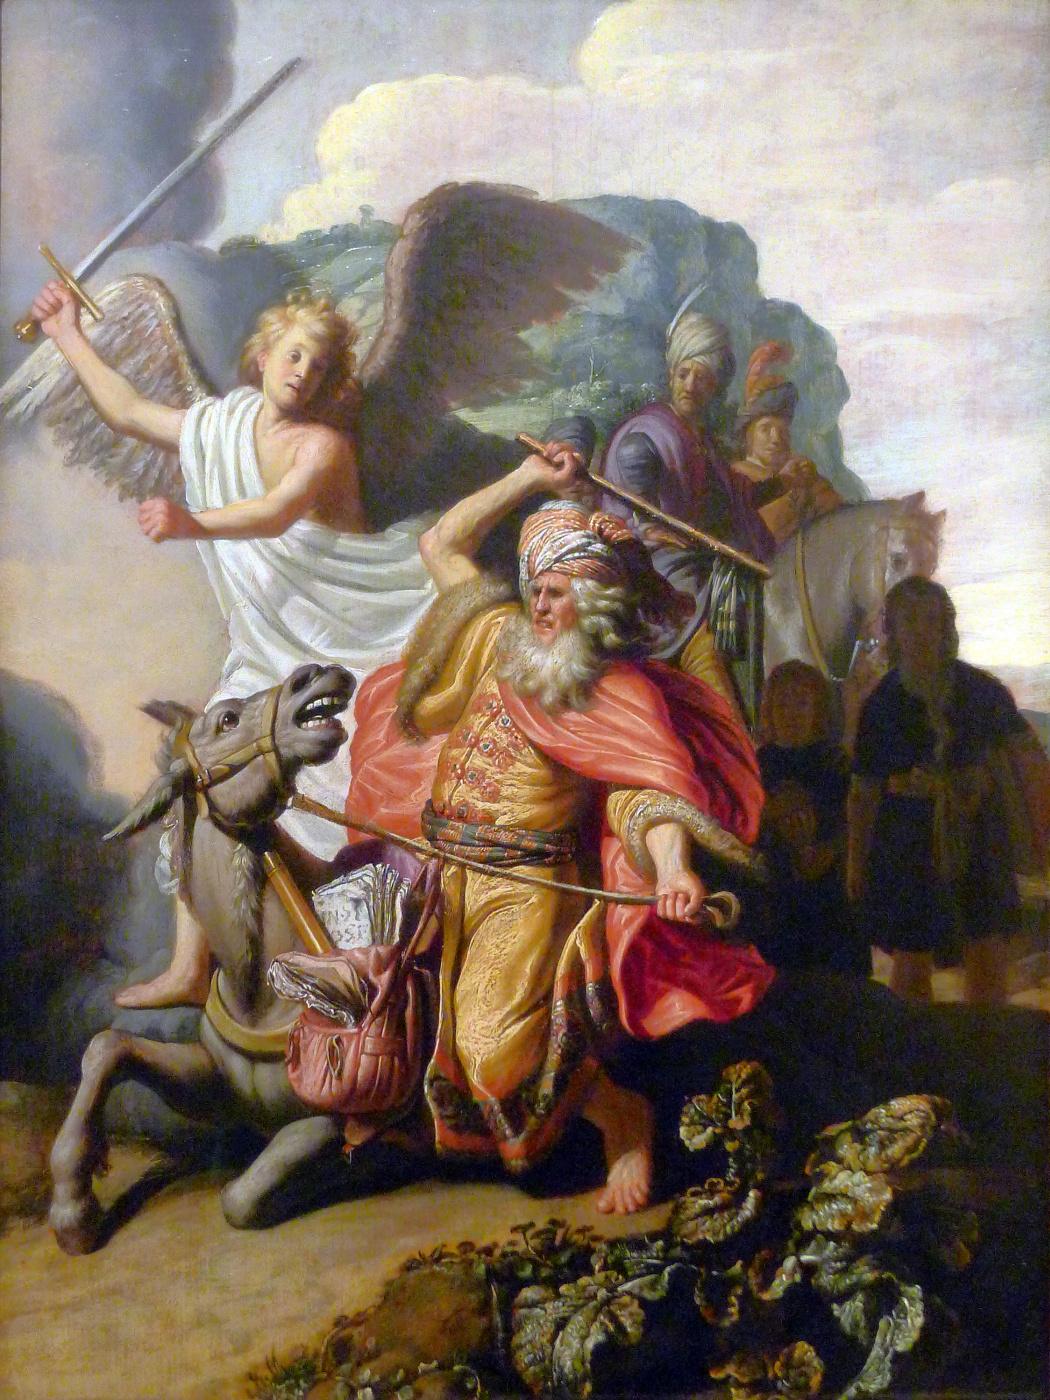 Rembrandt Harmenszoon van Rijn. The prophet Balaam and the donkey